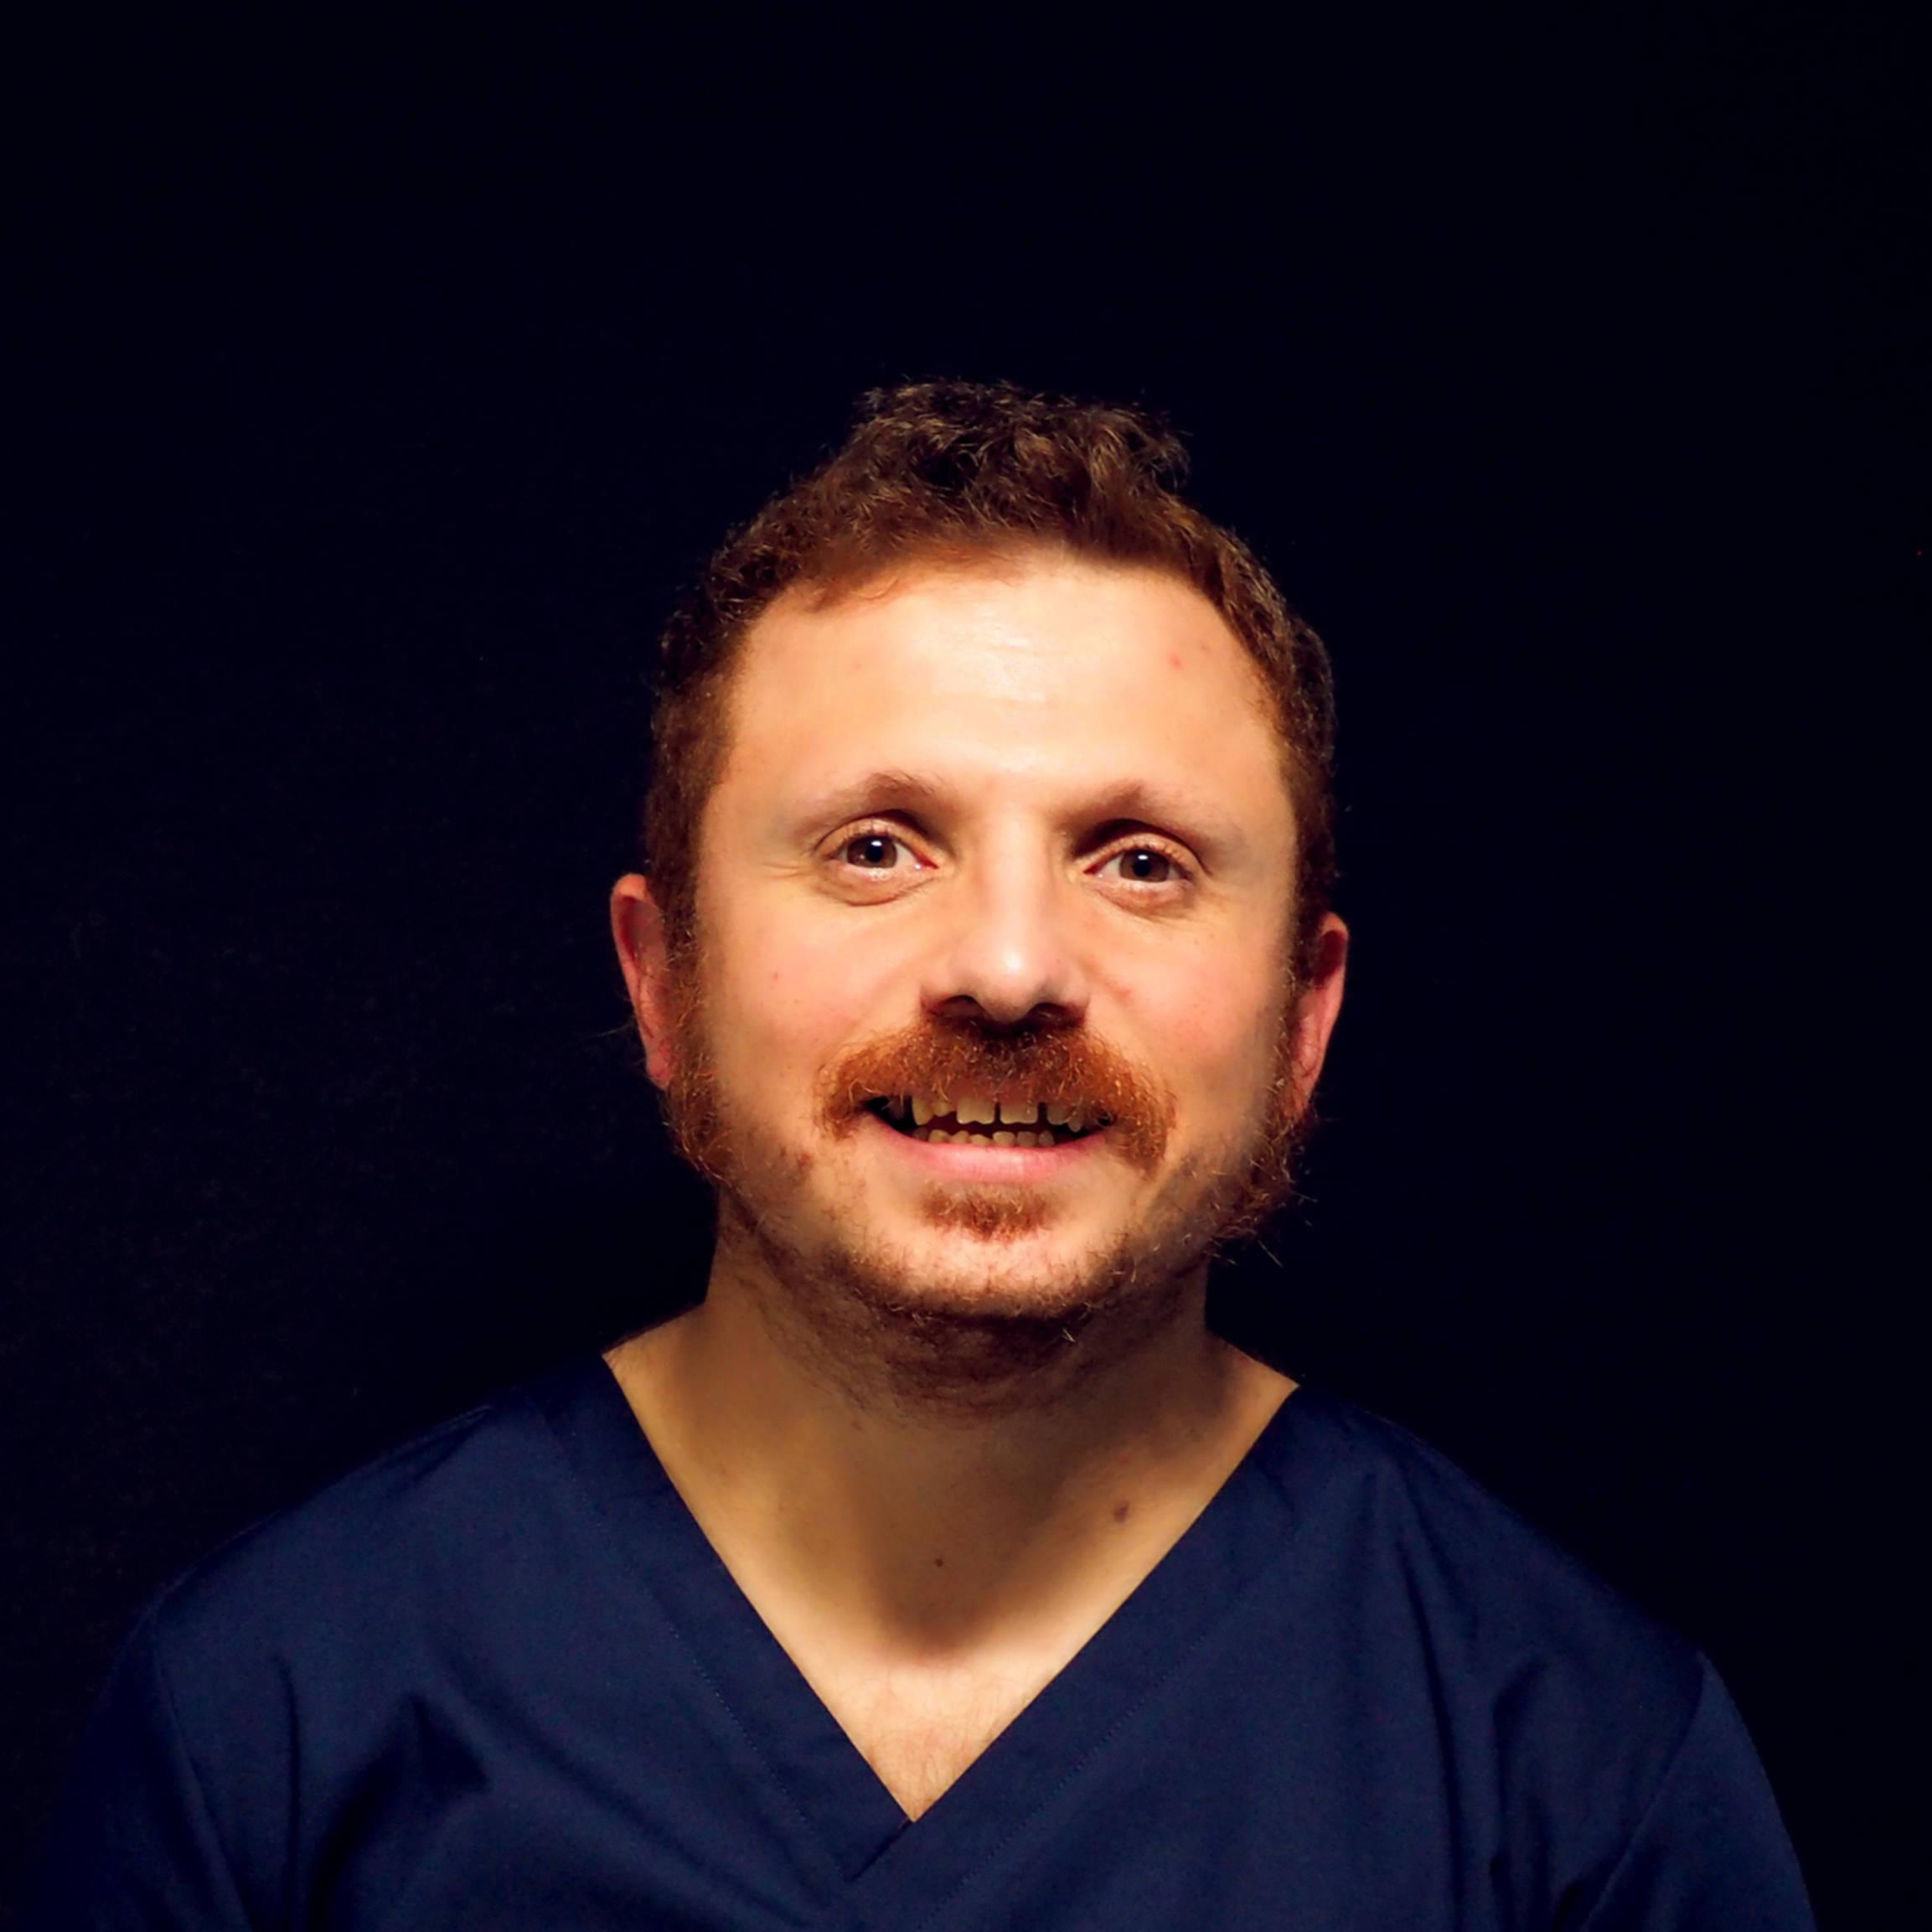 François-Xavier CARRAUD